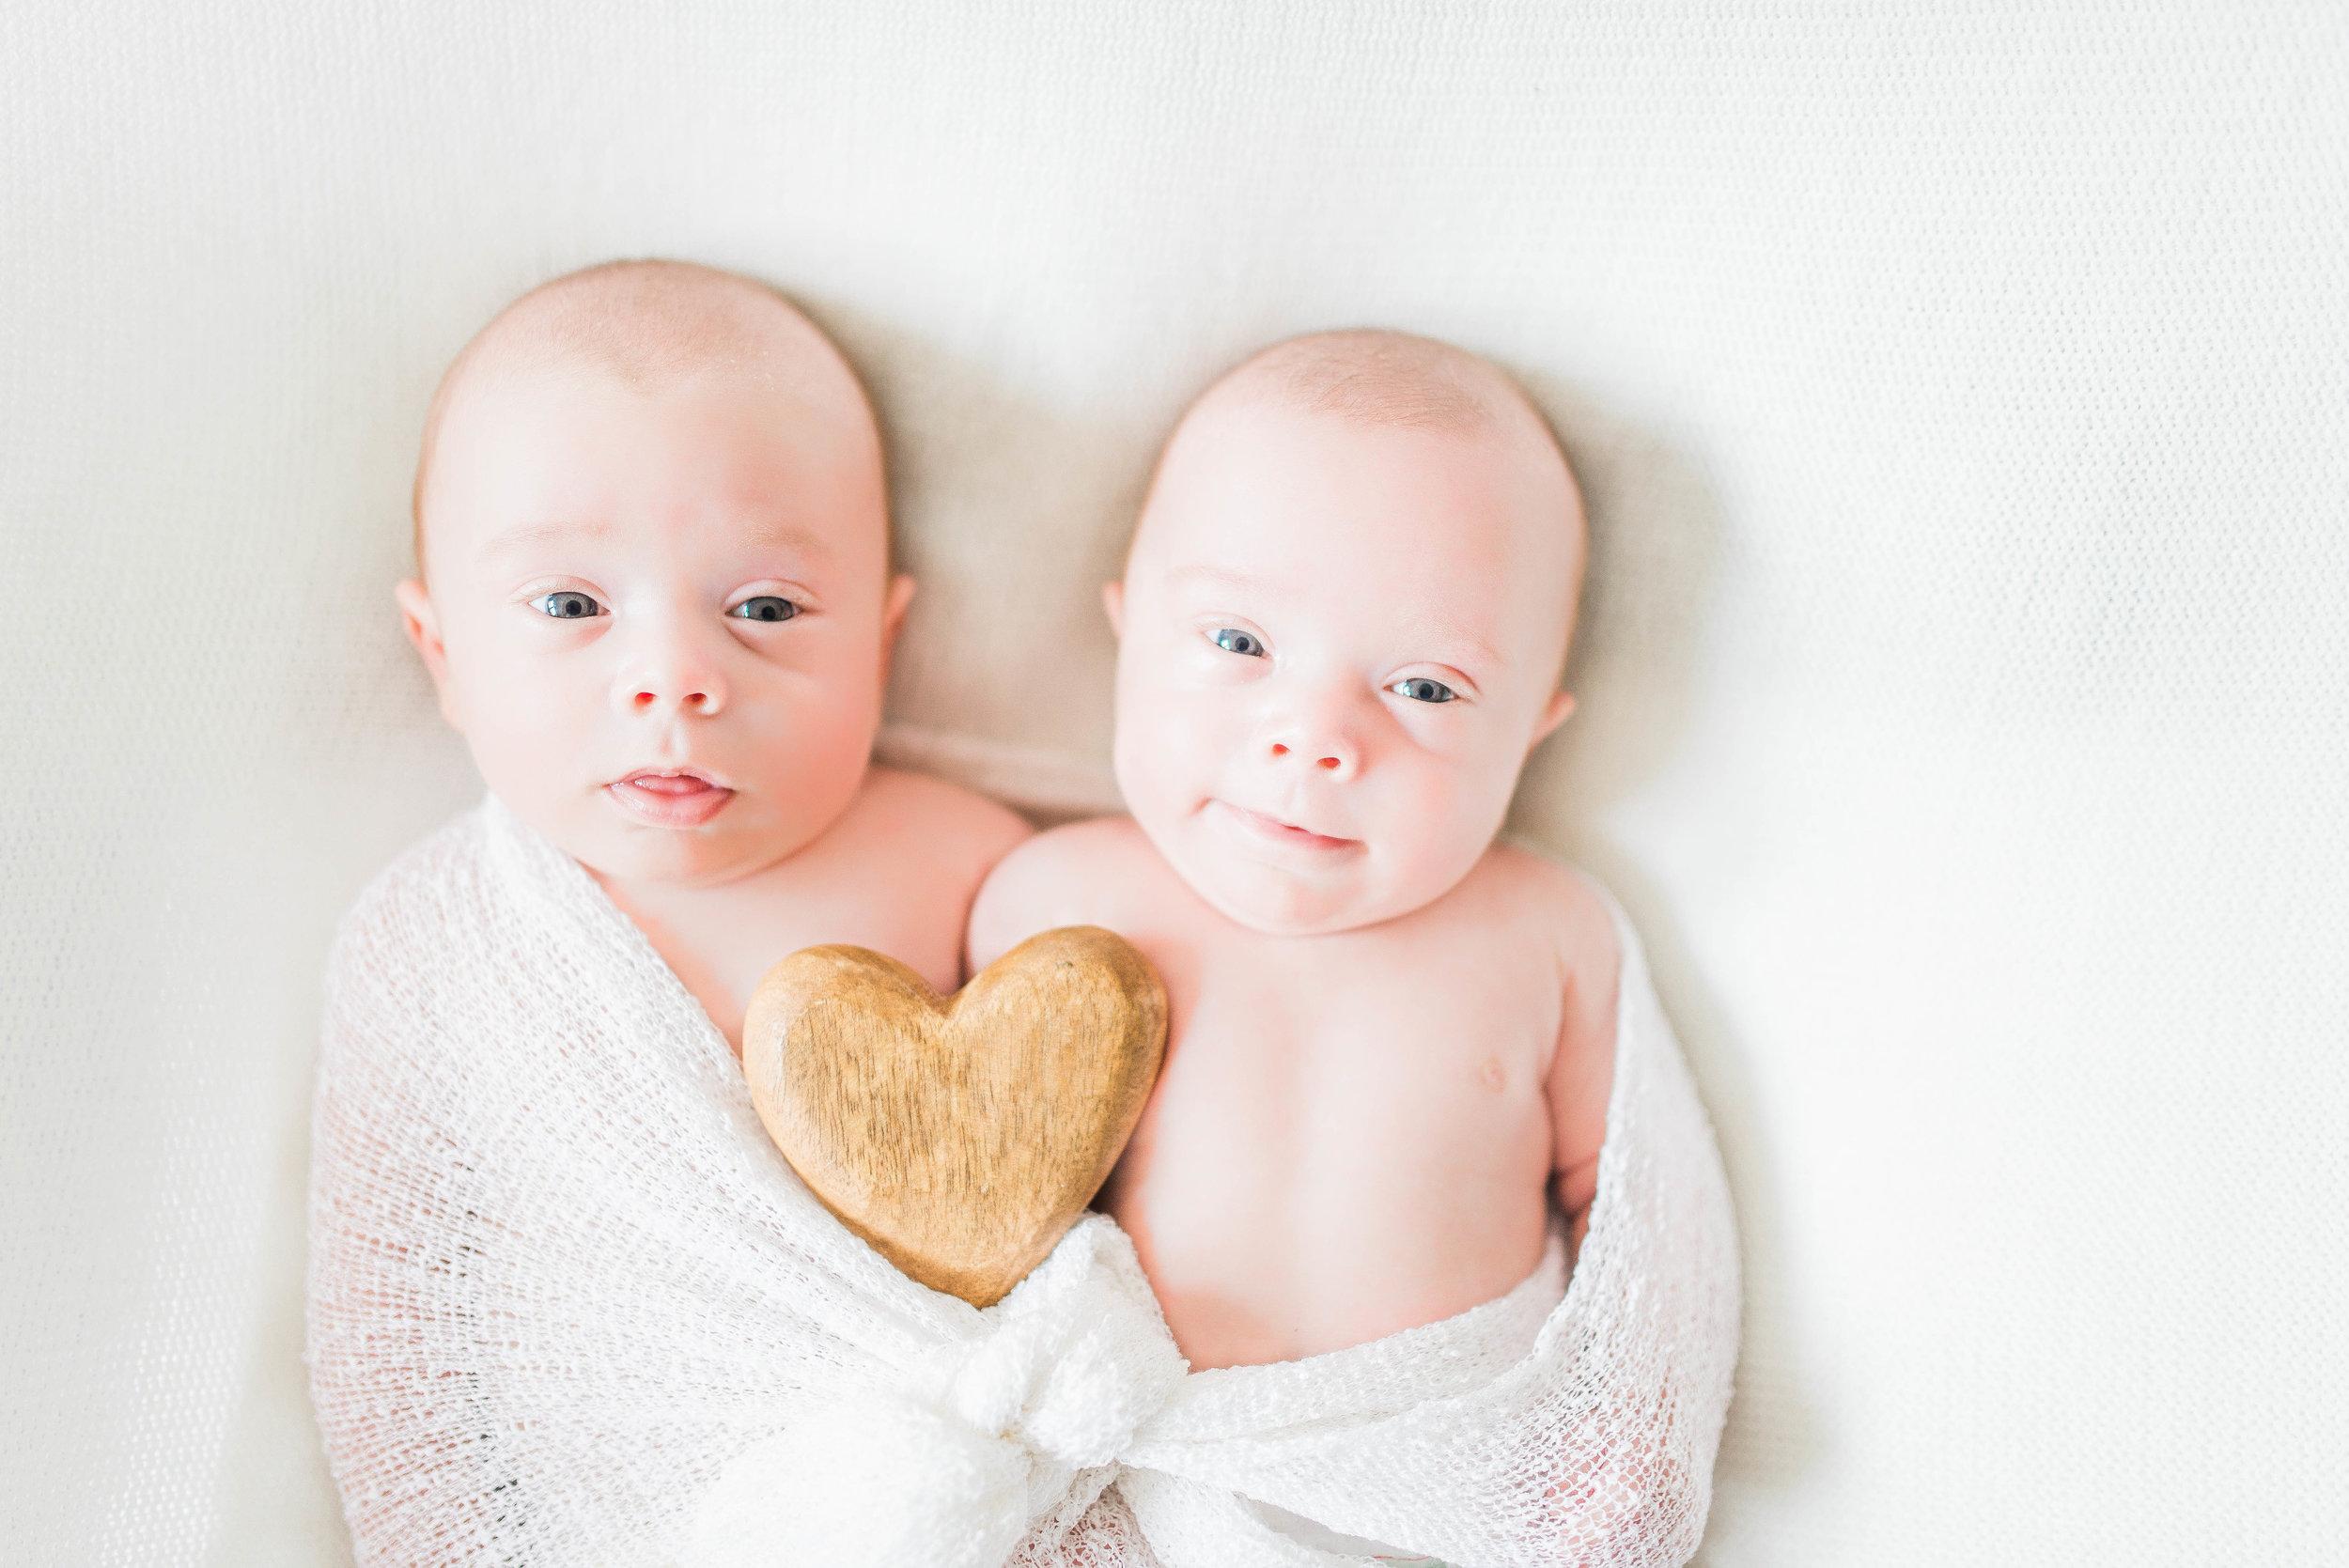 twins1prev-2.jpg